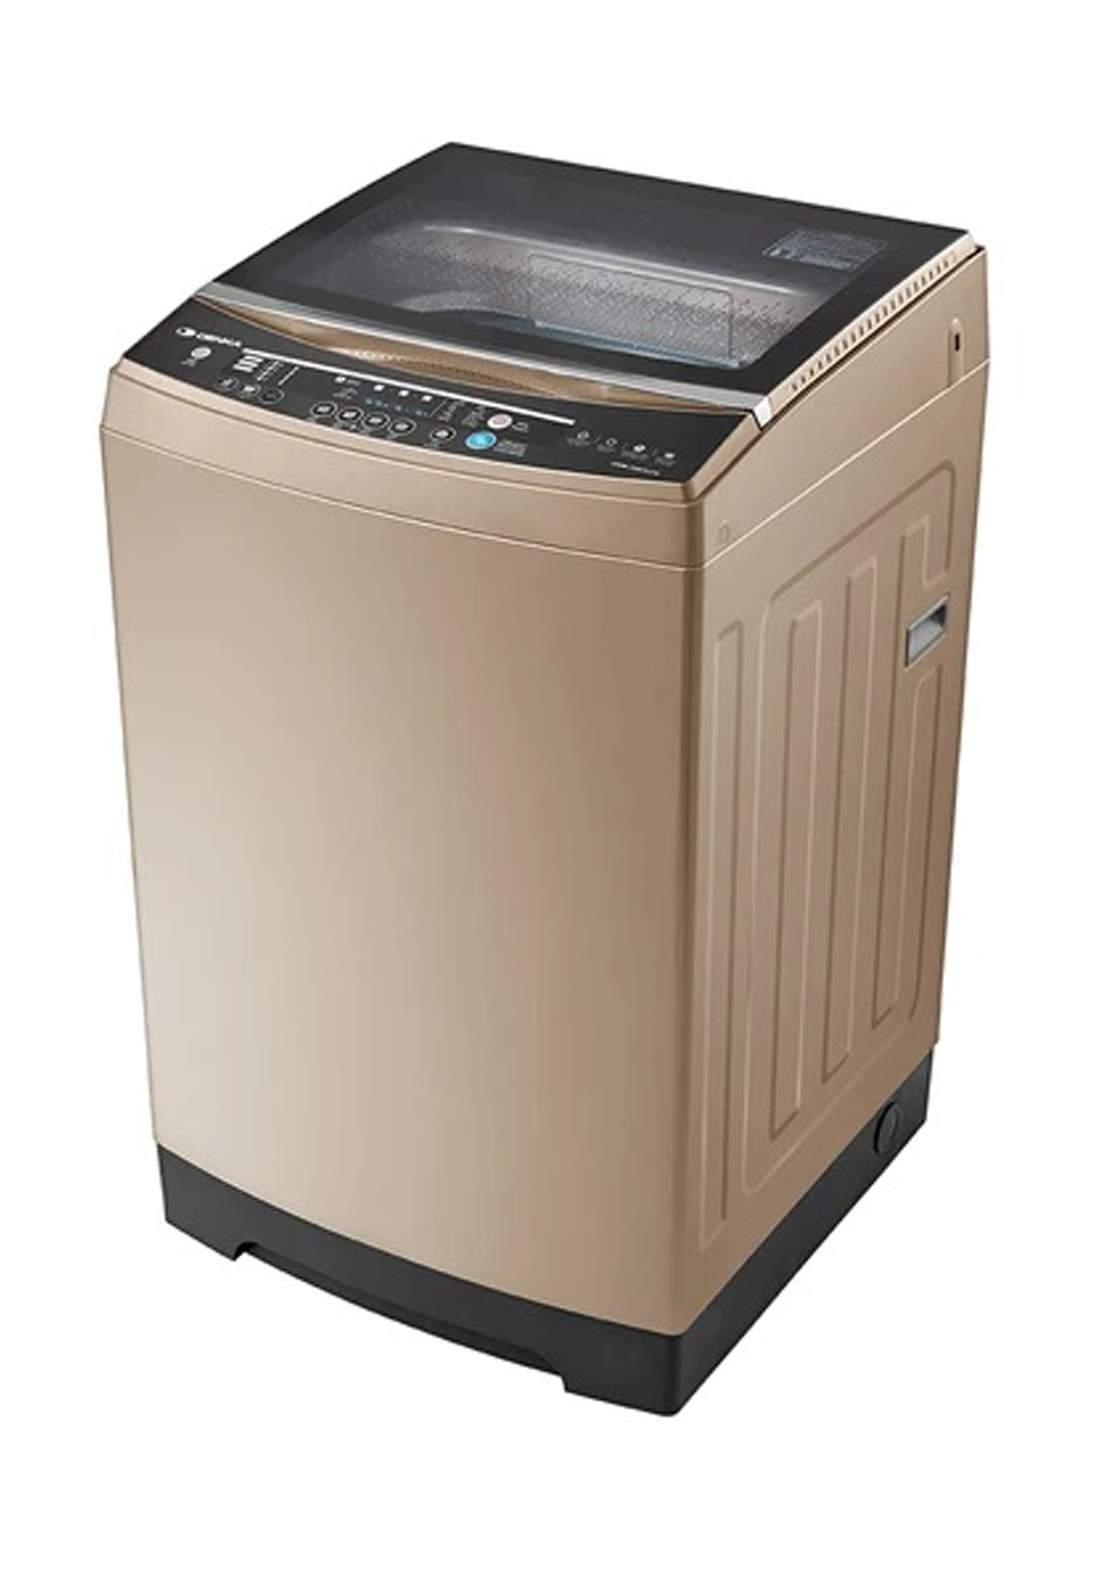 DENKA QWM-1300TLCG washing machine 13kg  غسالة ملابس